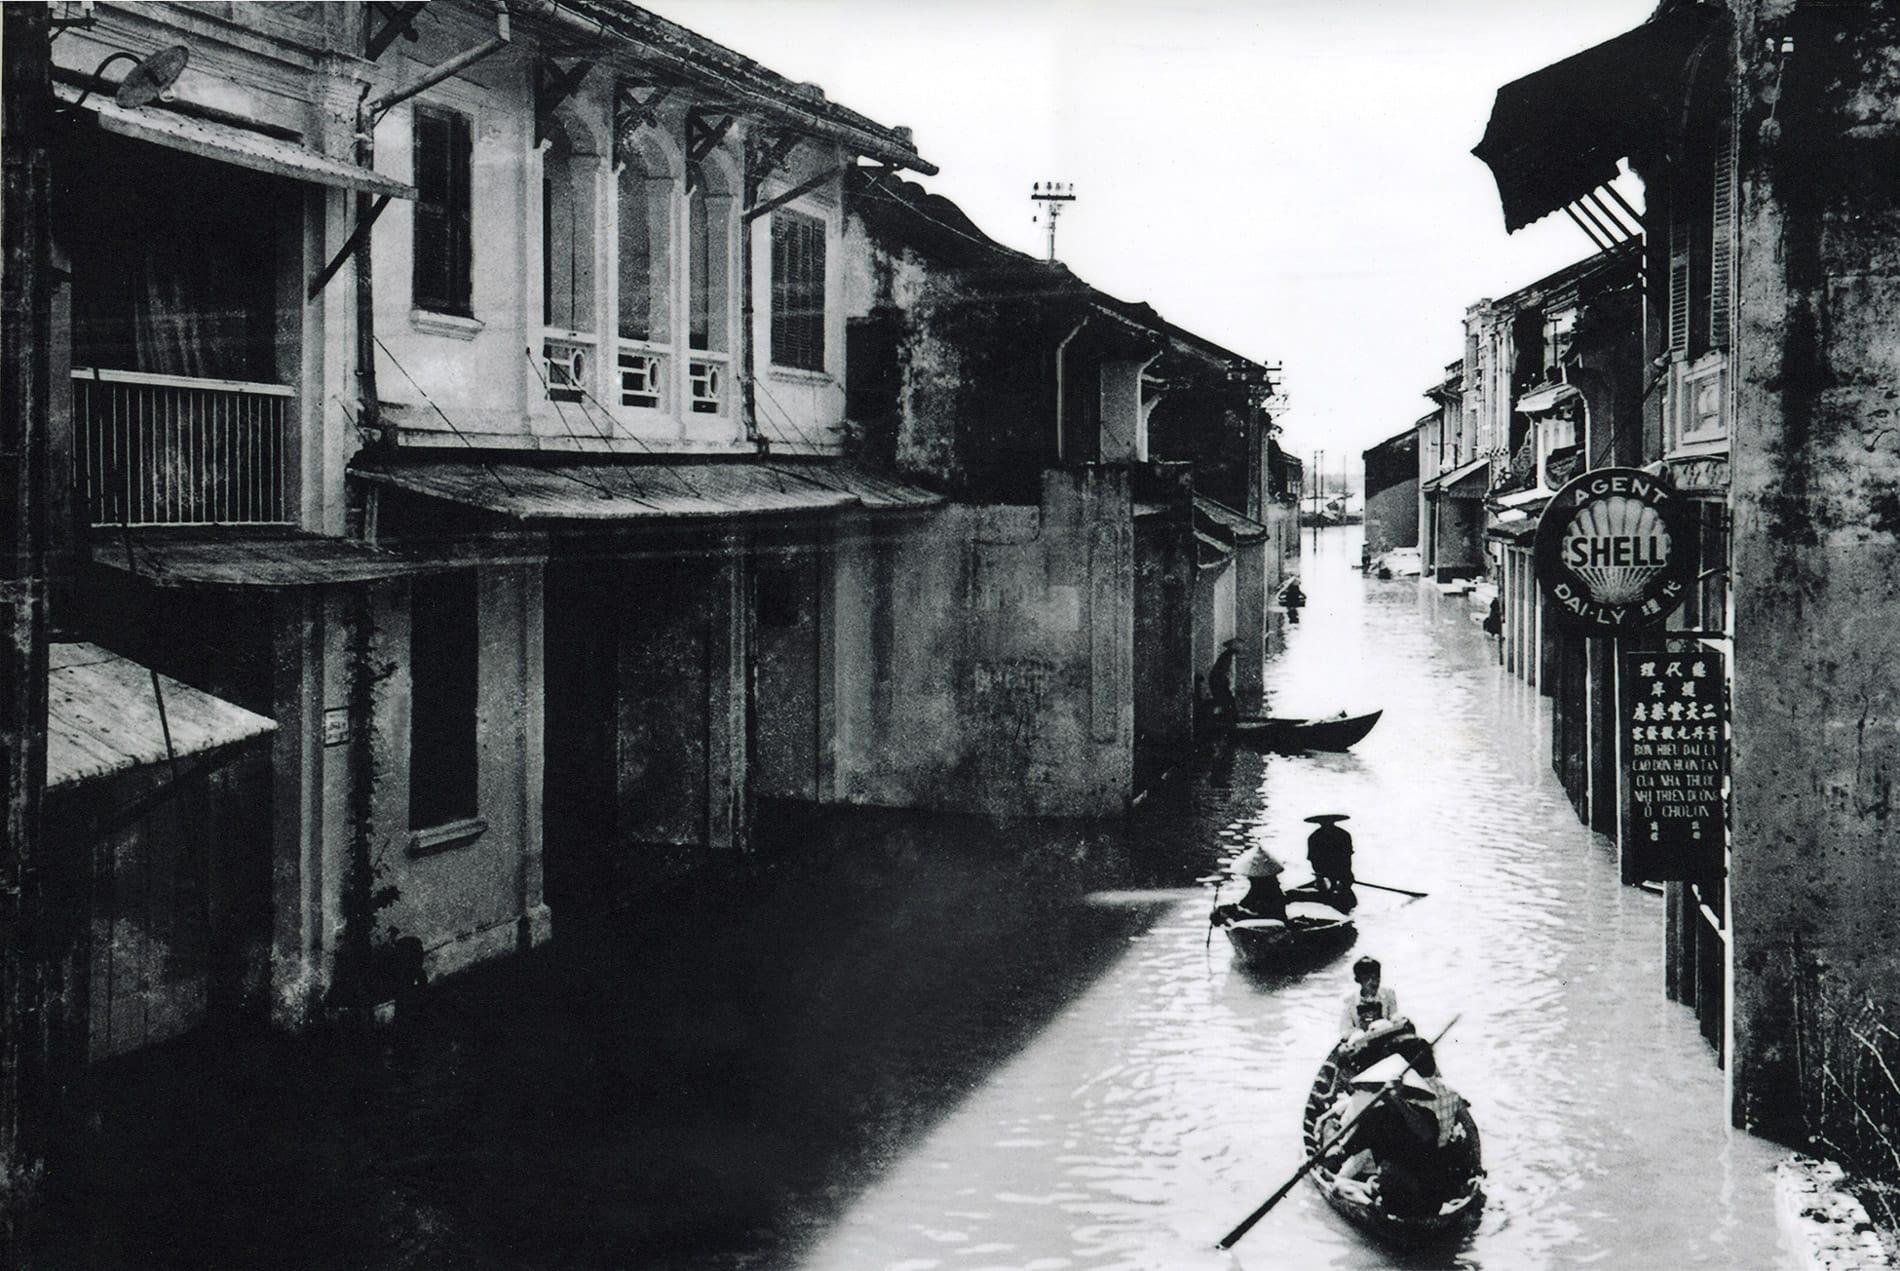 an old photo of Hoi An during a major flood